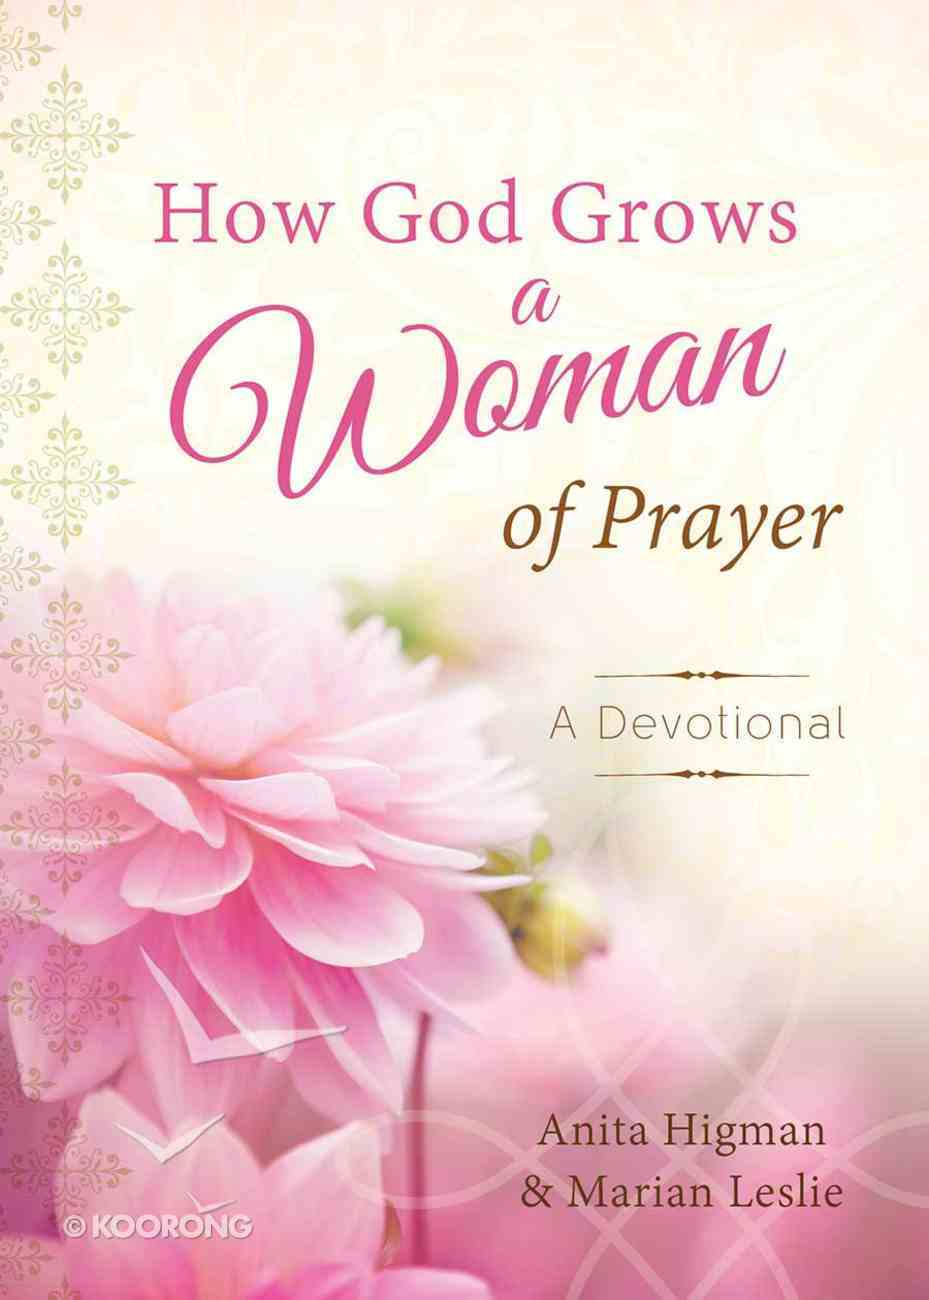 How God Grows a Woman of Prayer Hardback